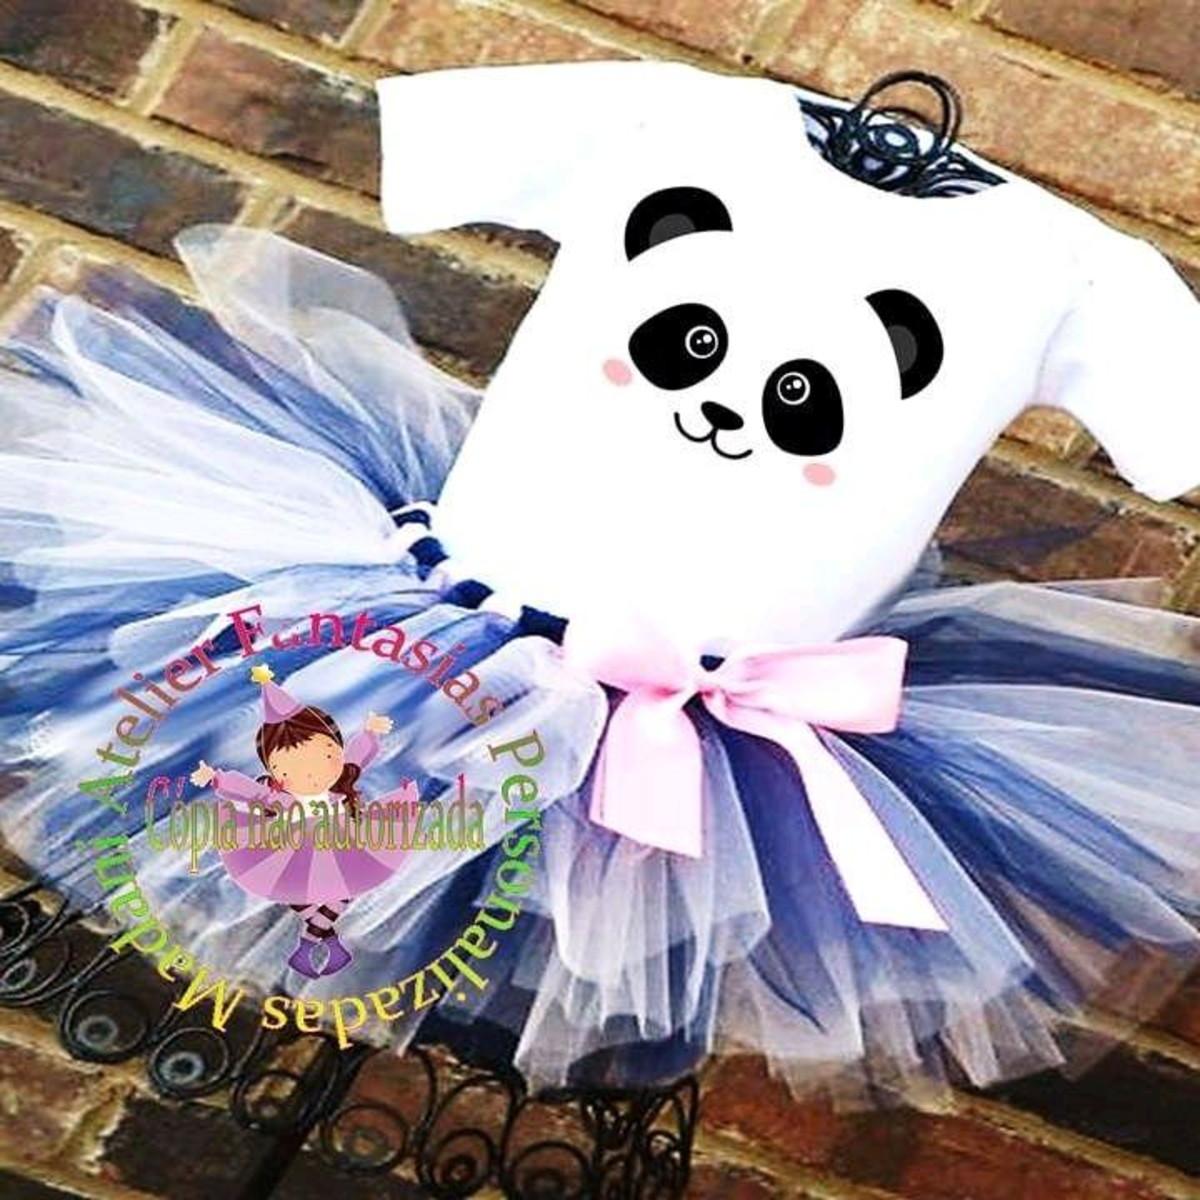 Fantasia Luxo Urso Panda 1 Ao 8 No Elo7 Atelier Madani Fantasias Personalizadas E9fc78